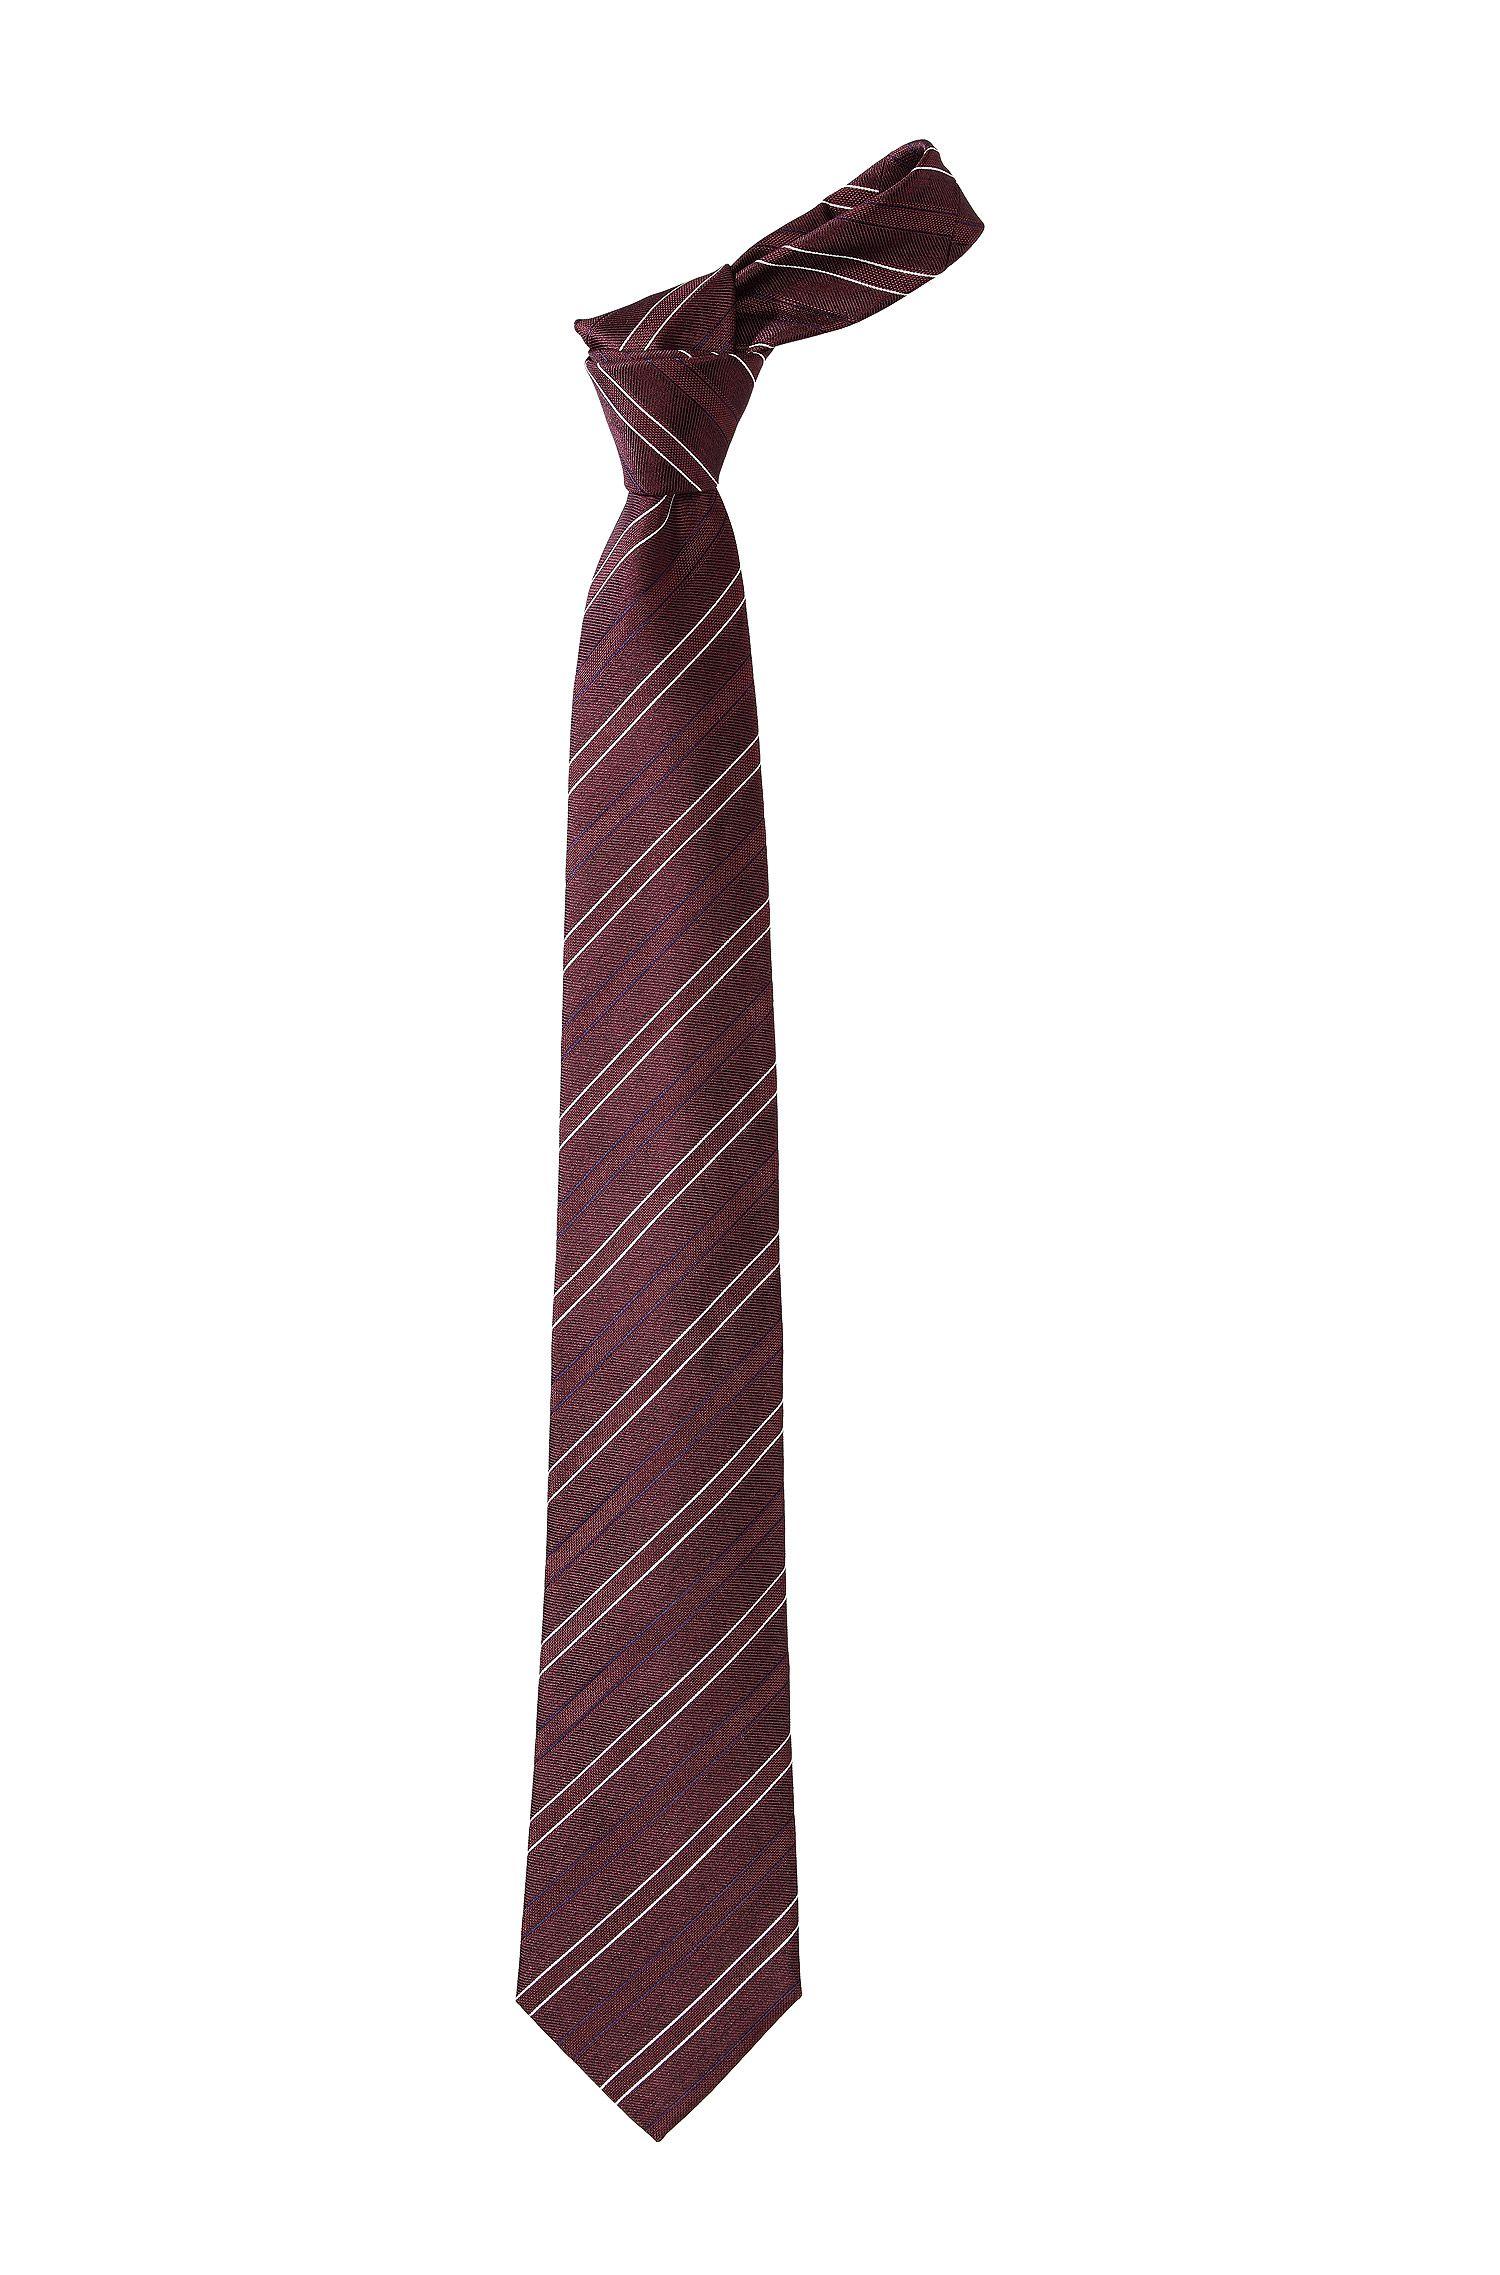 Tie with woven stripe pattern 'Tie CM 8'